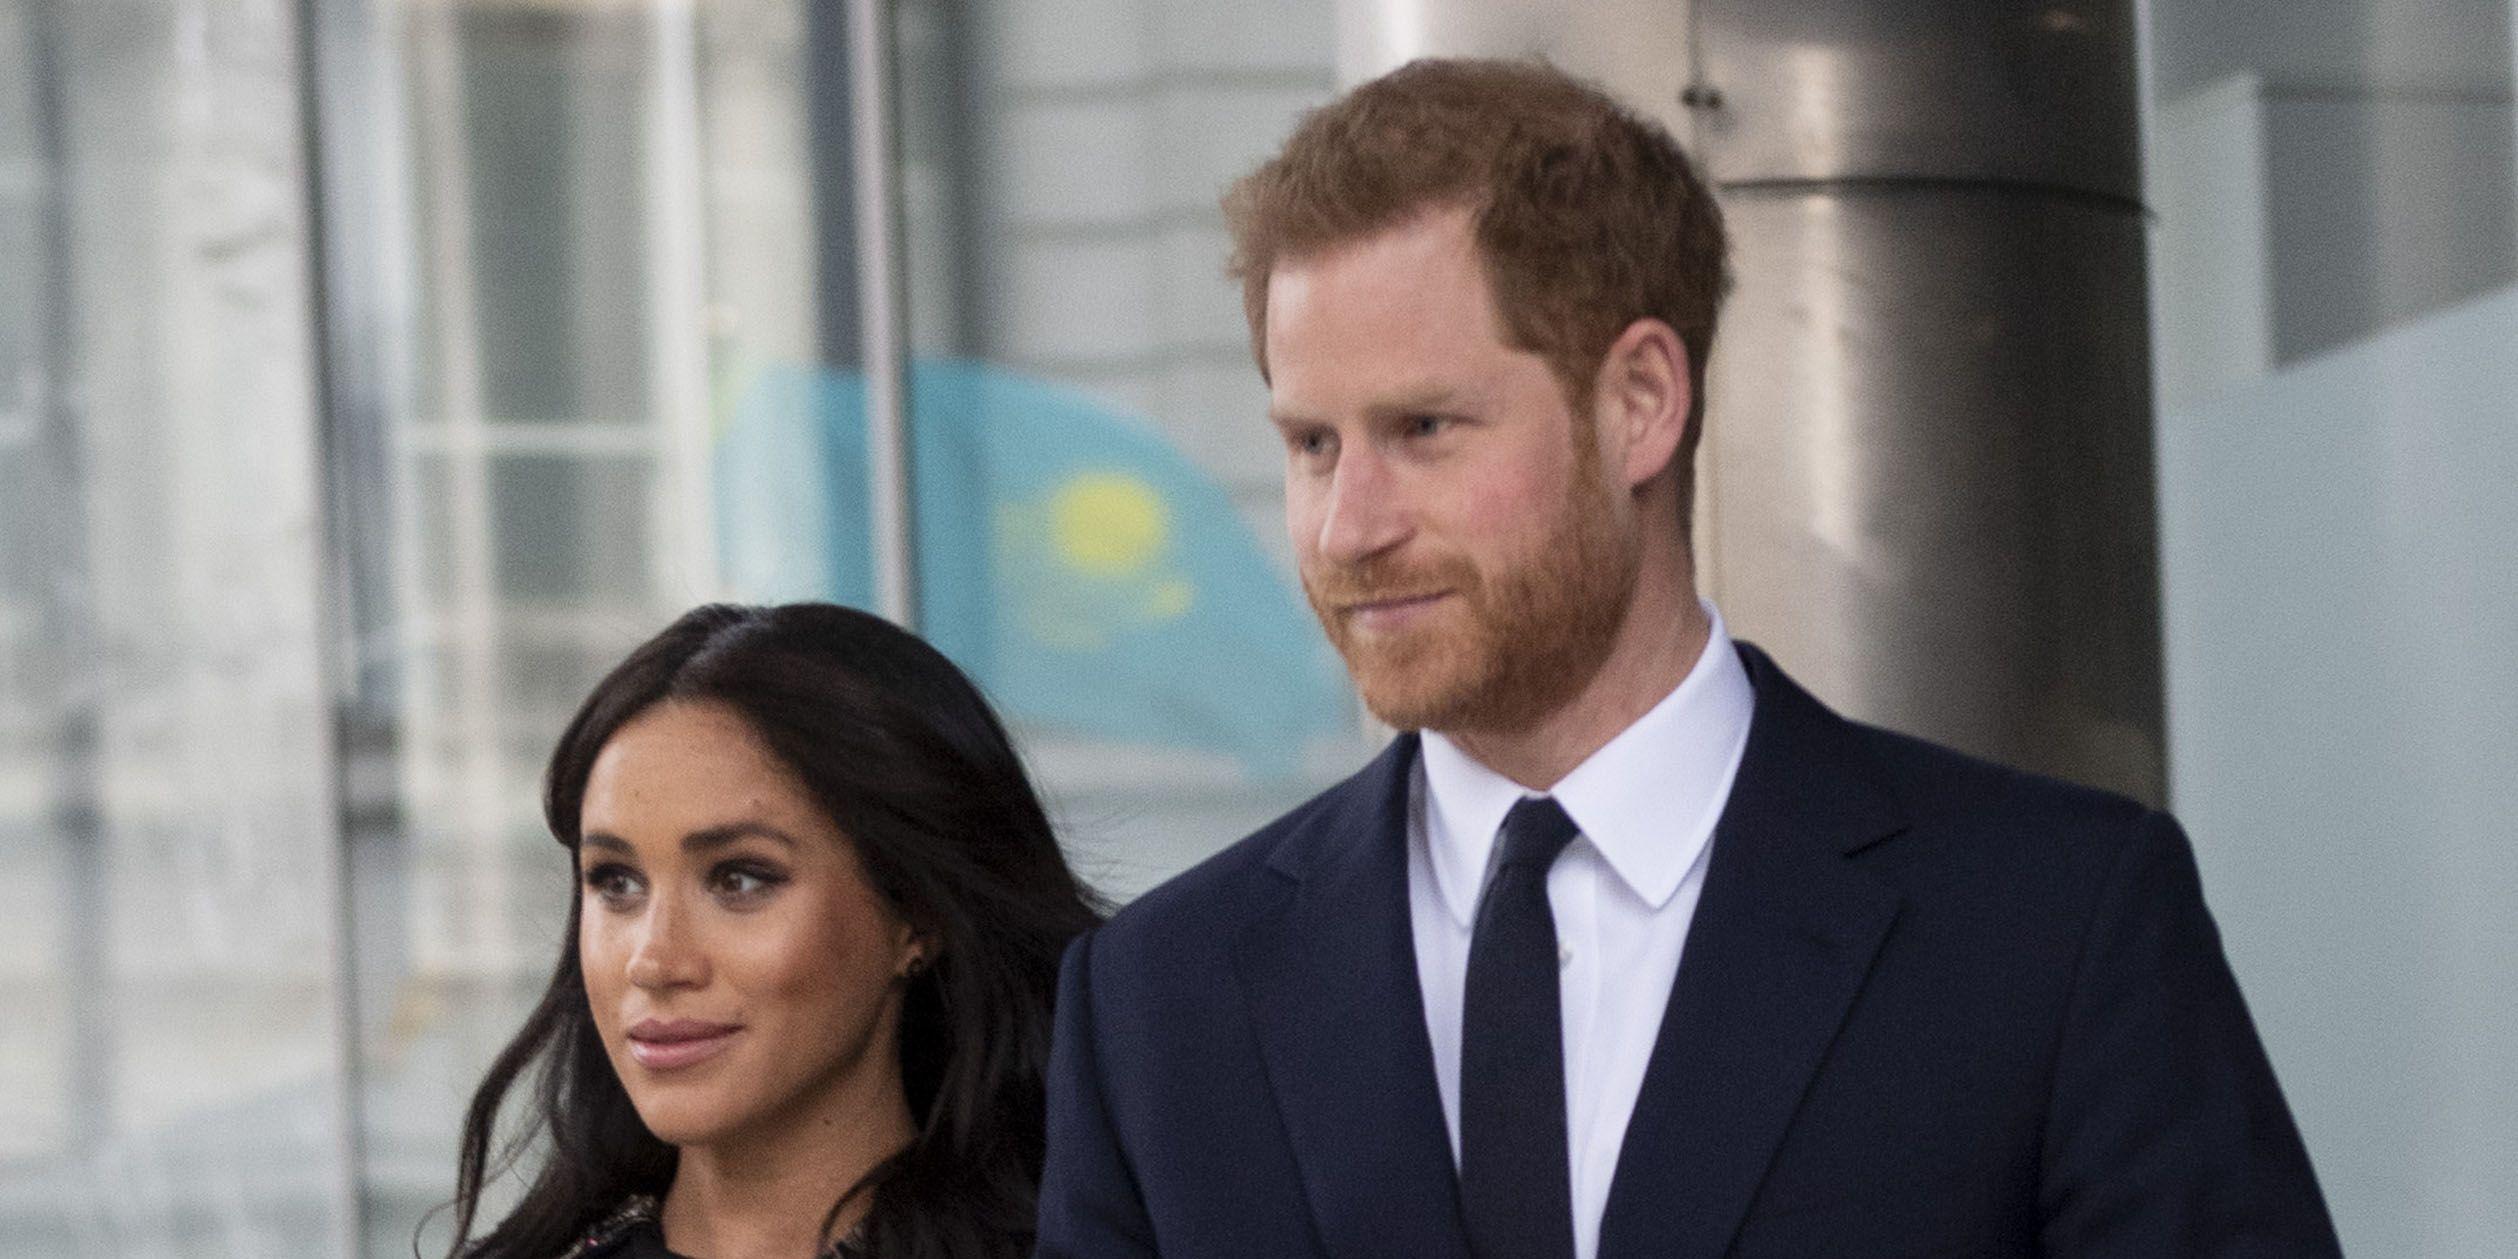 meghan-markle-prins-harry-komst-royal-baby